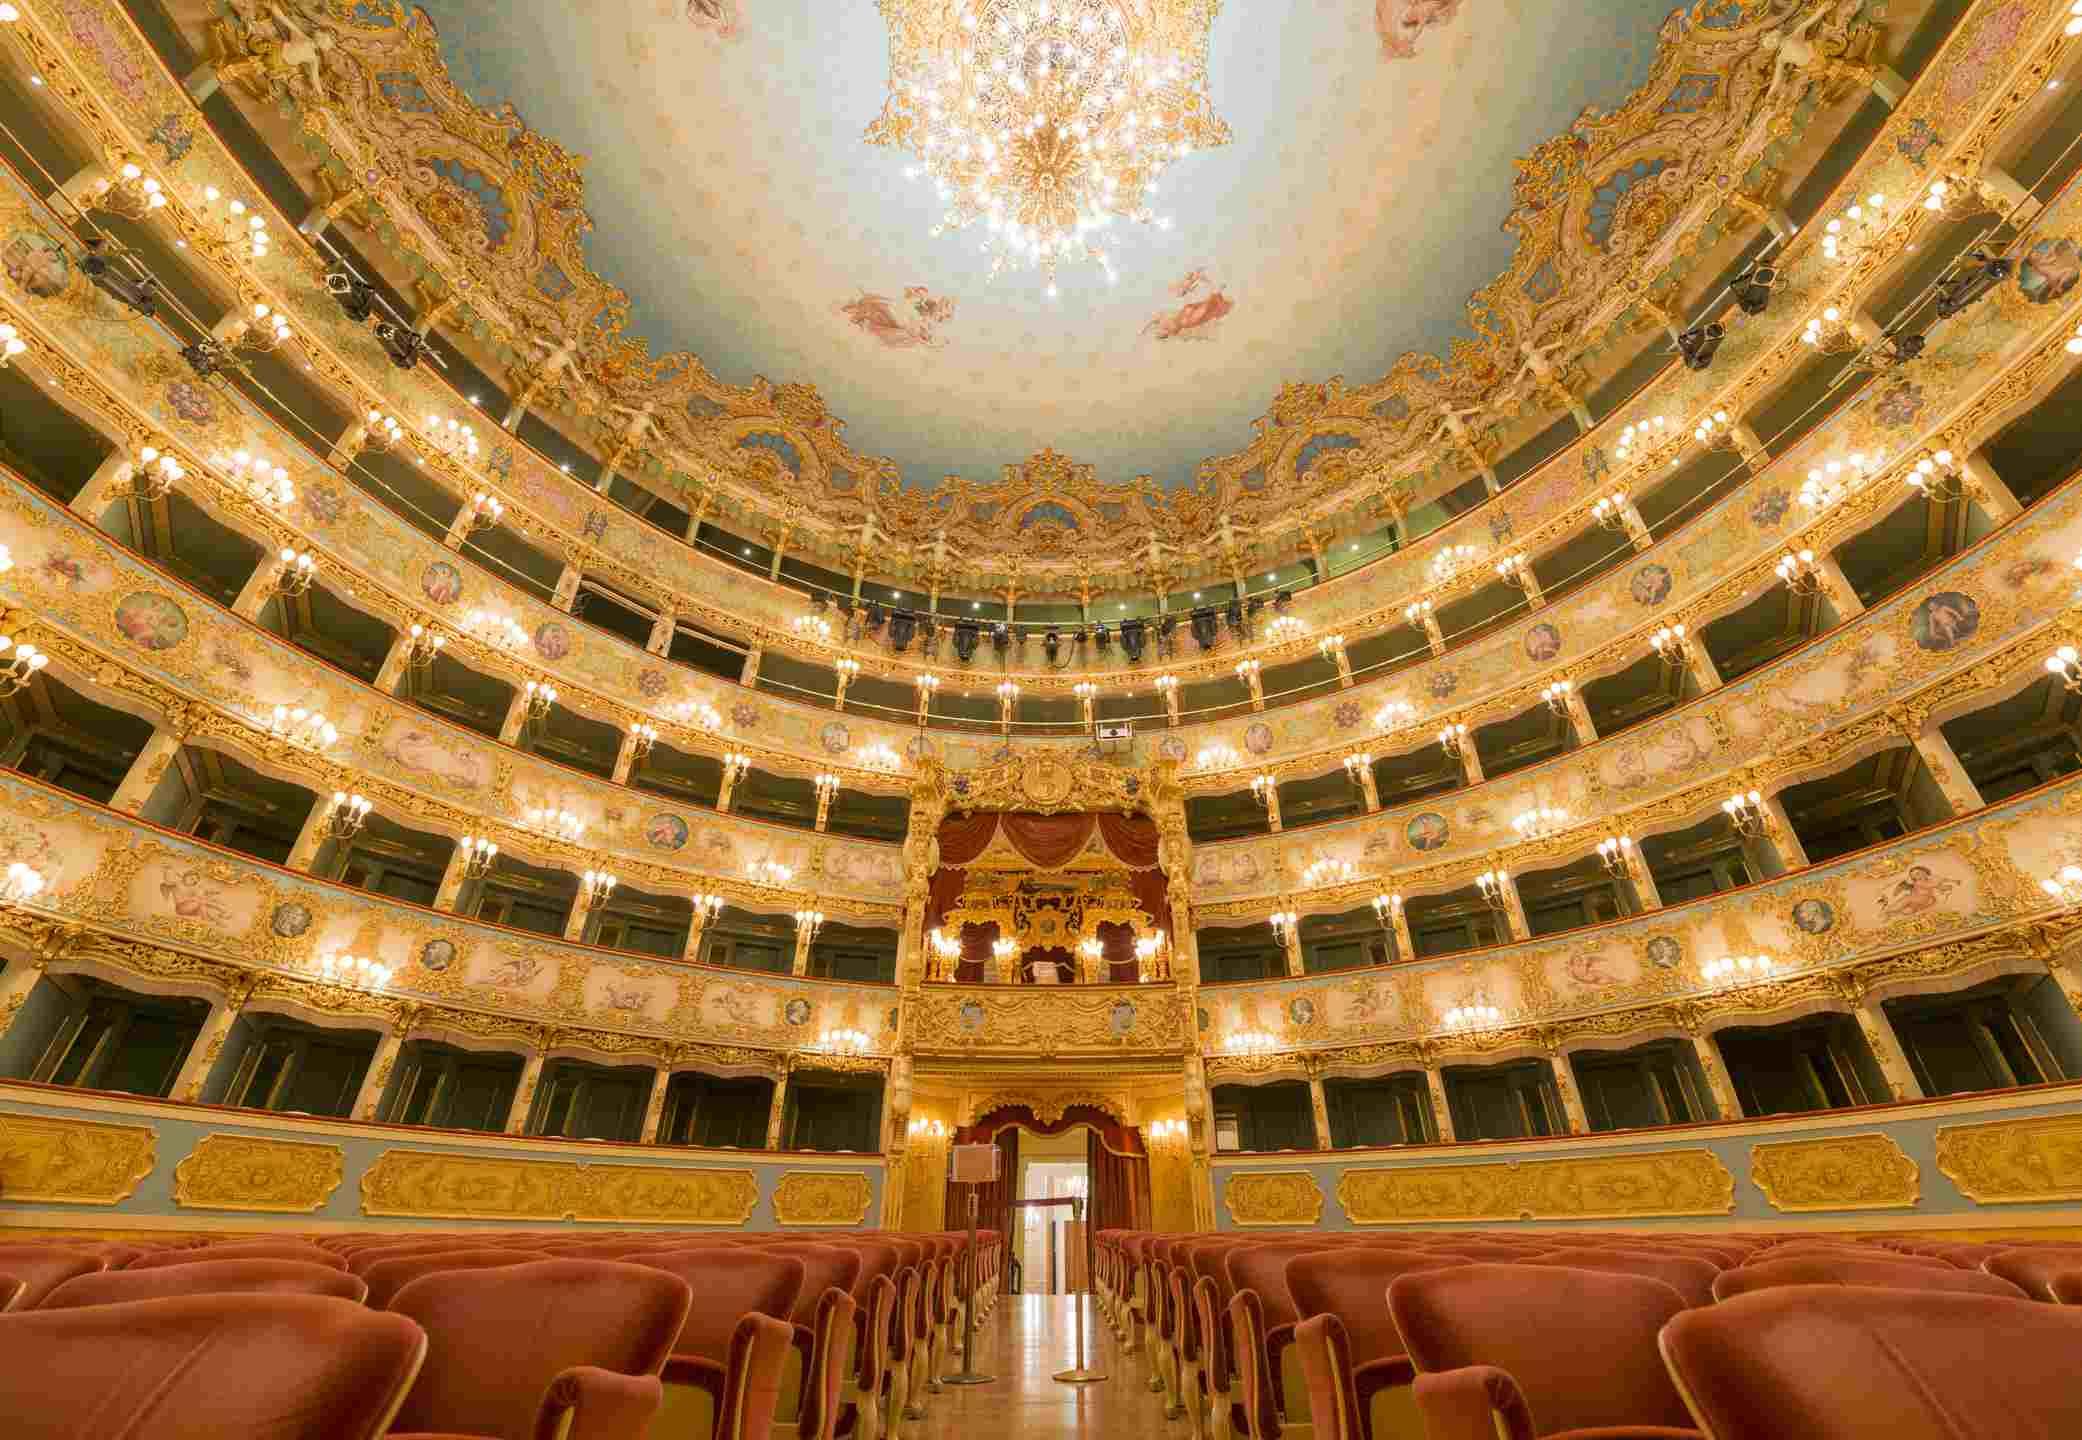 Gran Teatro La Fenice with king balcony in Venice Italy